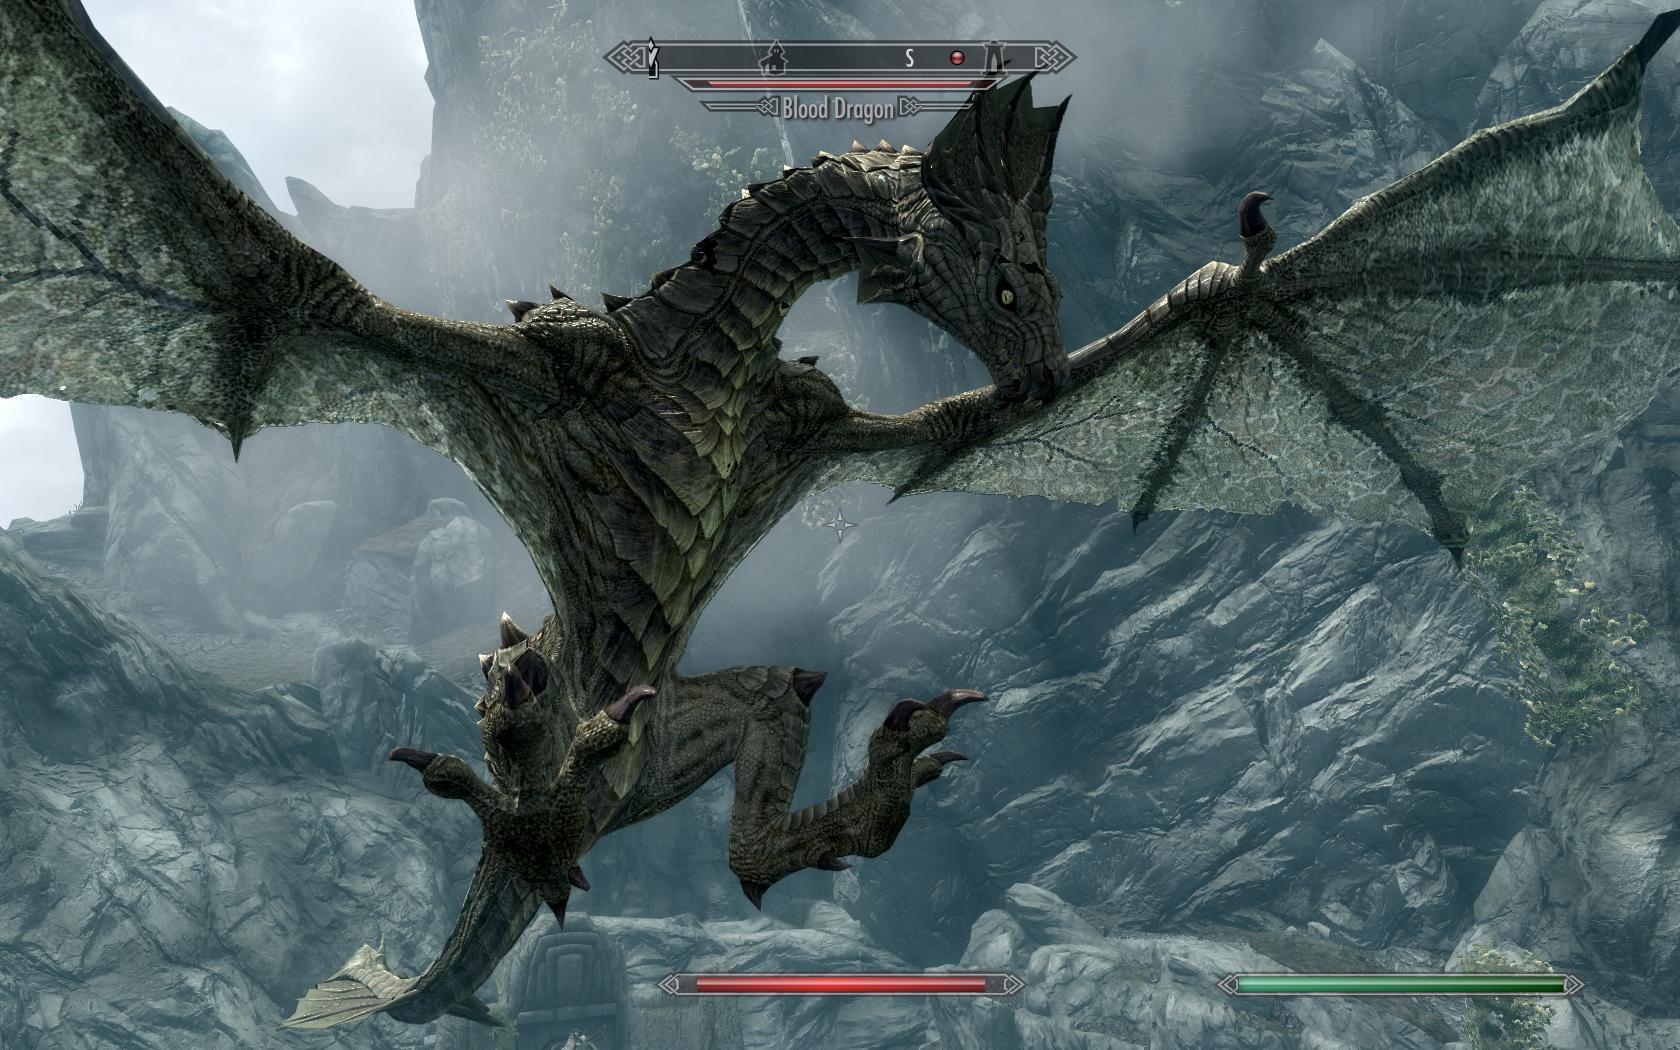 Skyrim Dragon: Skyrim-dragon02 By GiuseppeDiRosso On DeviantArt